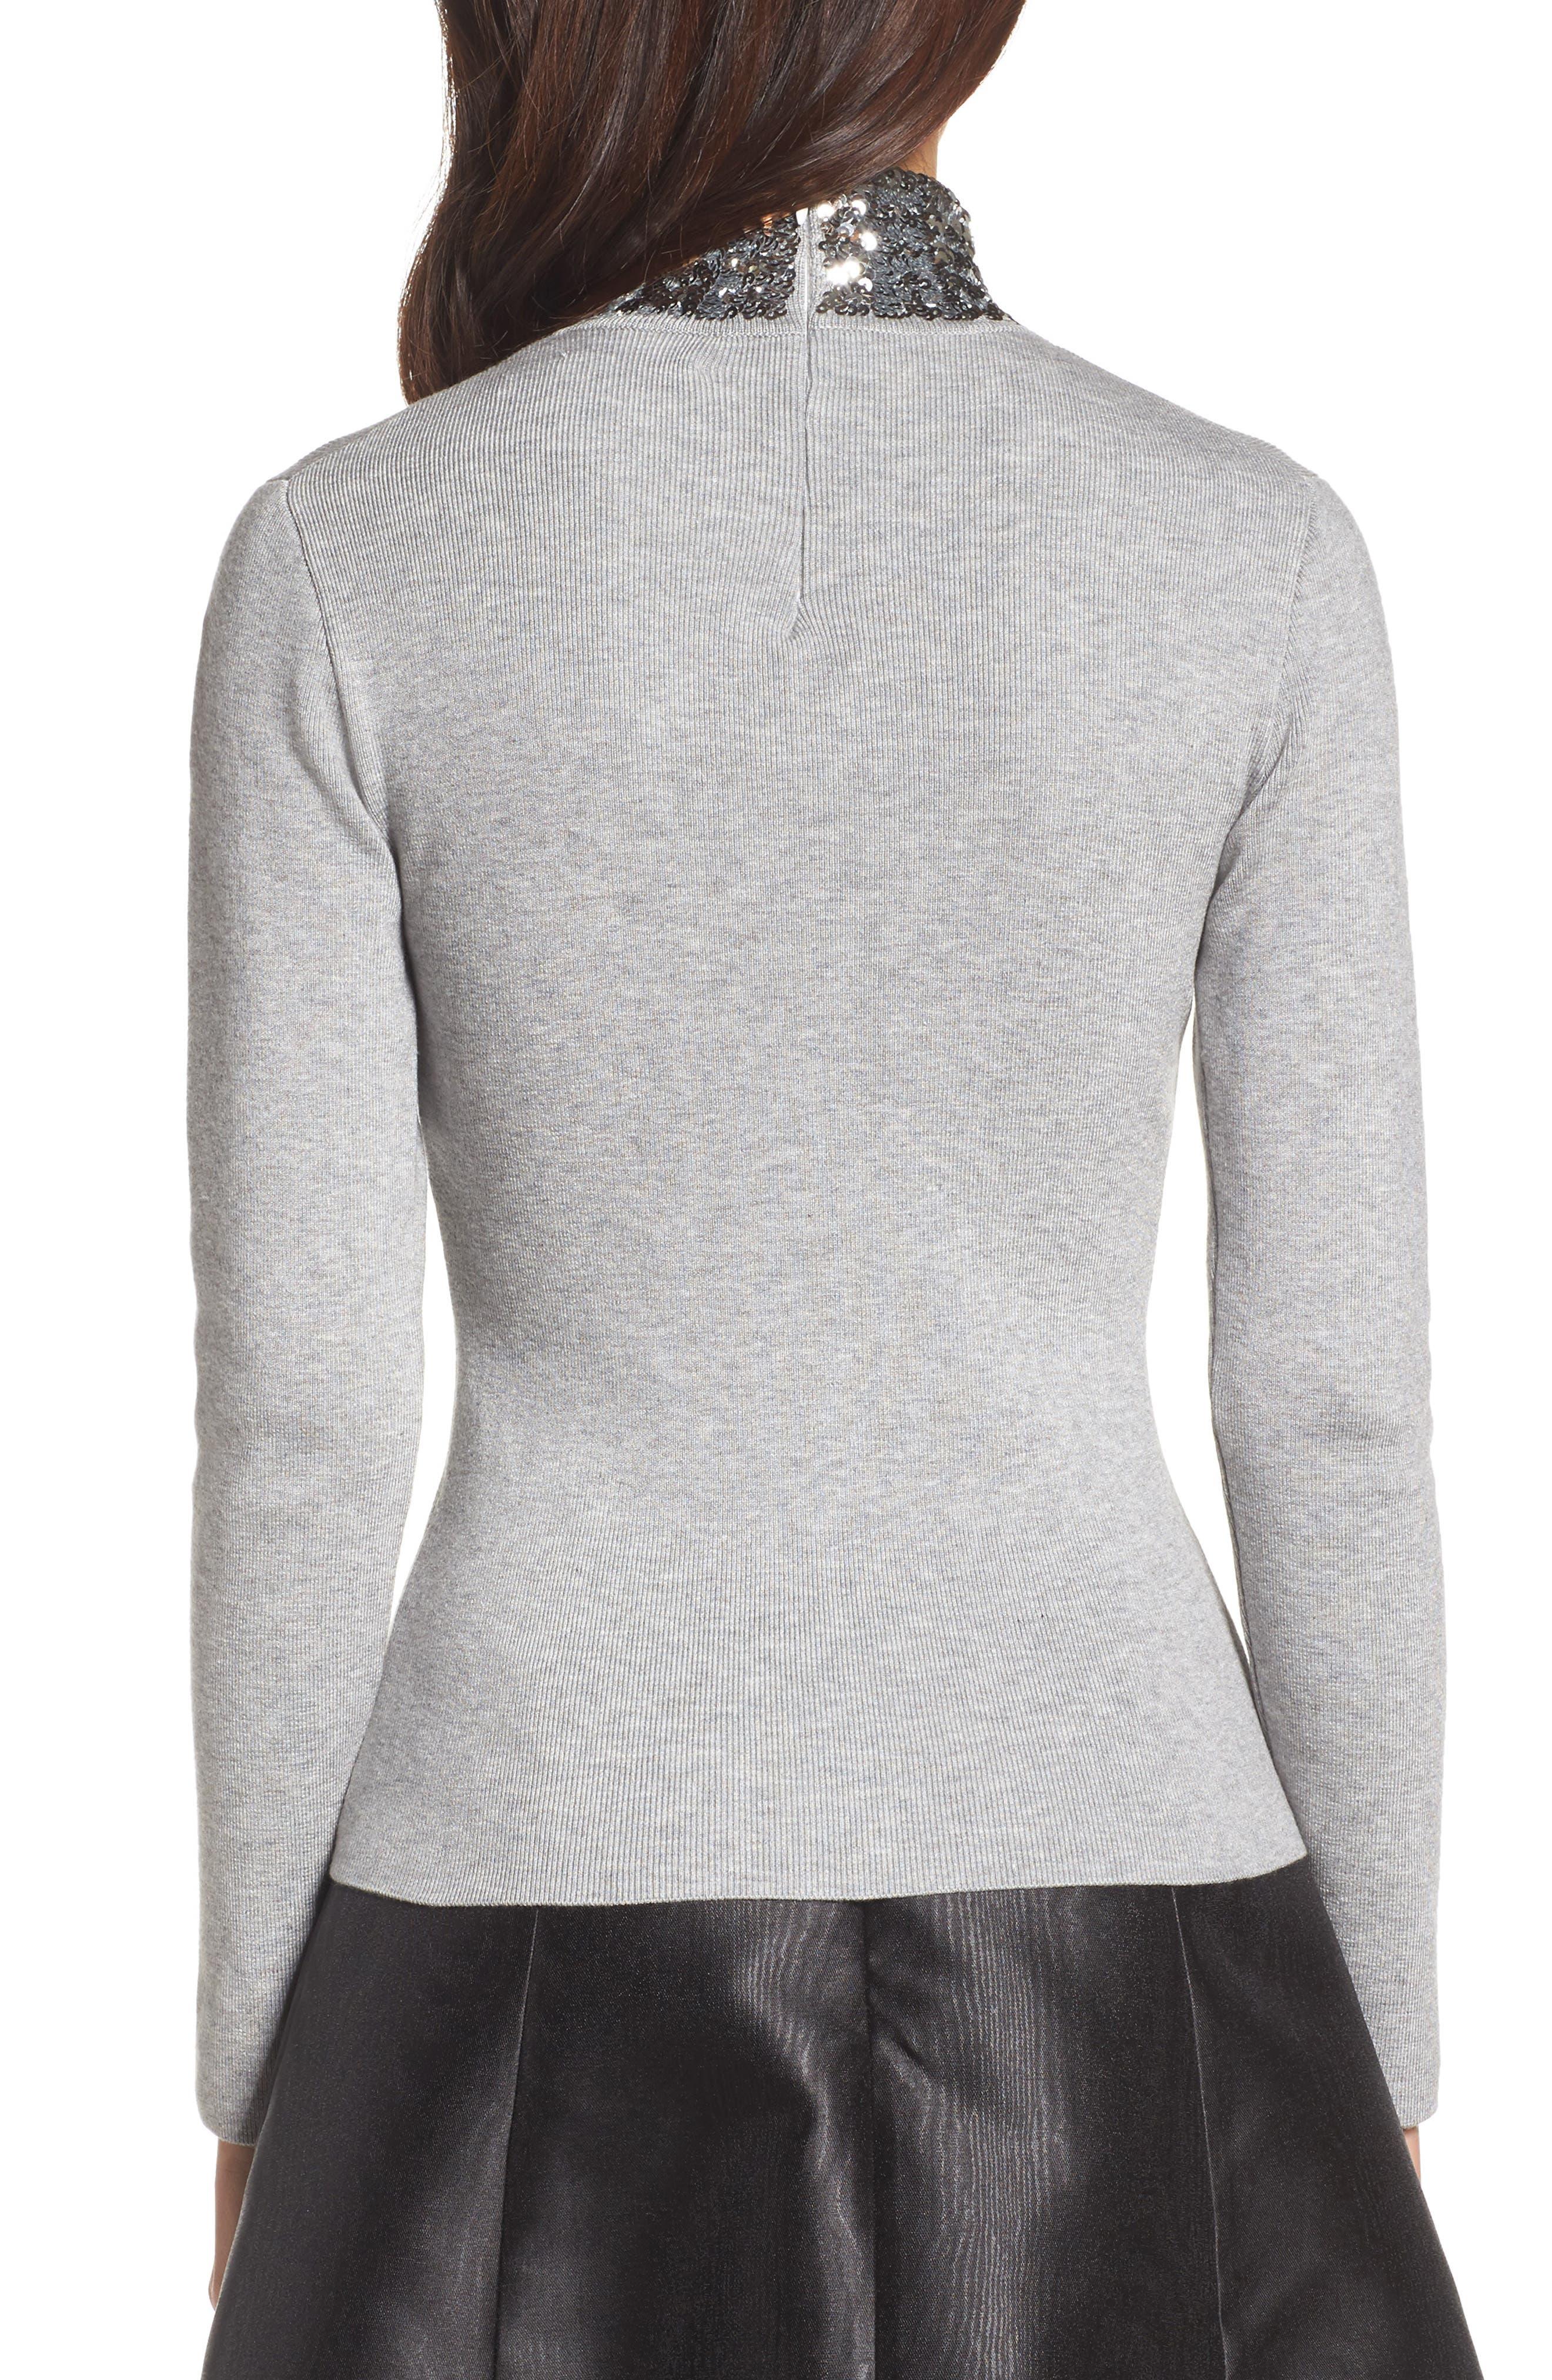 Sequin Mock Neck Sweater,                             Alternate thumbnail 2, color,                             030